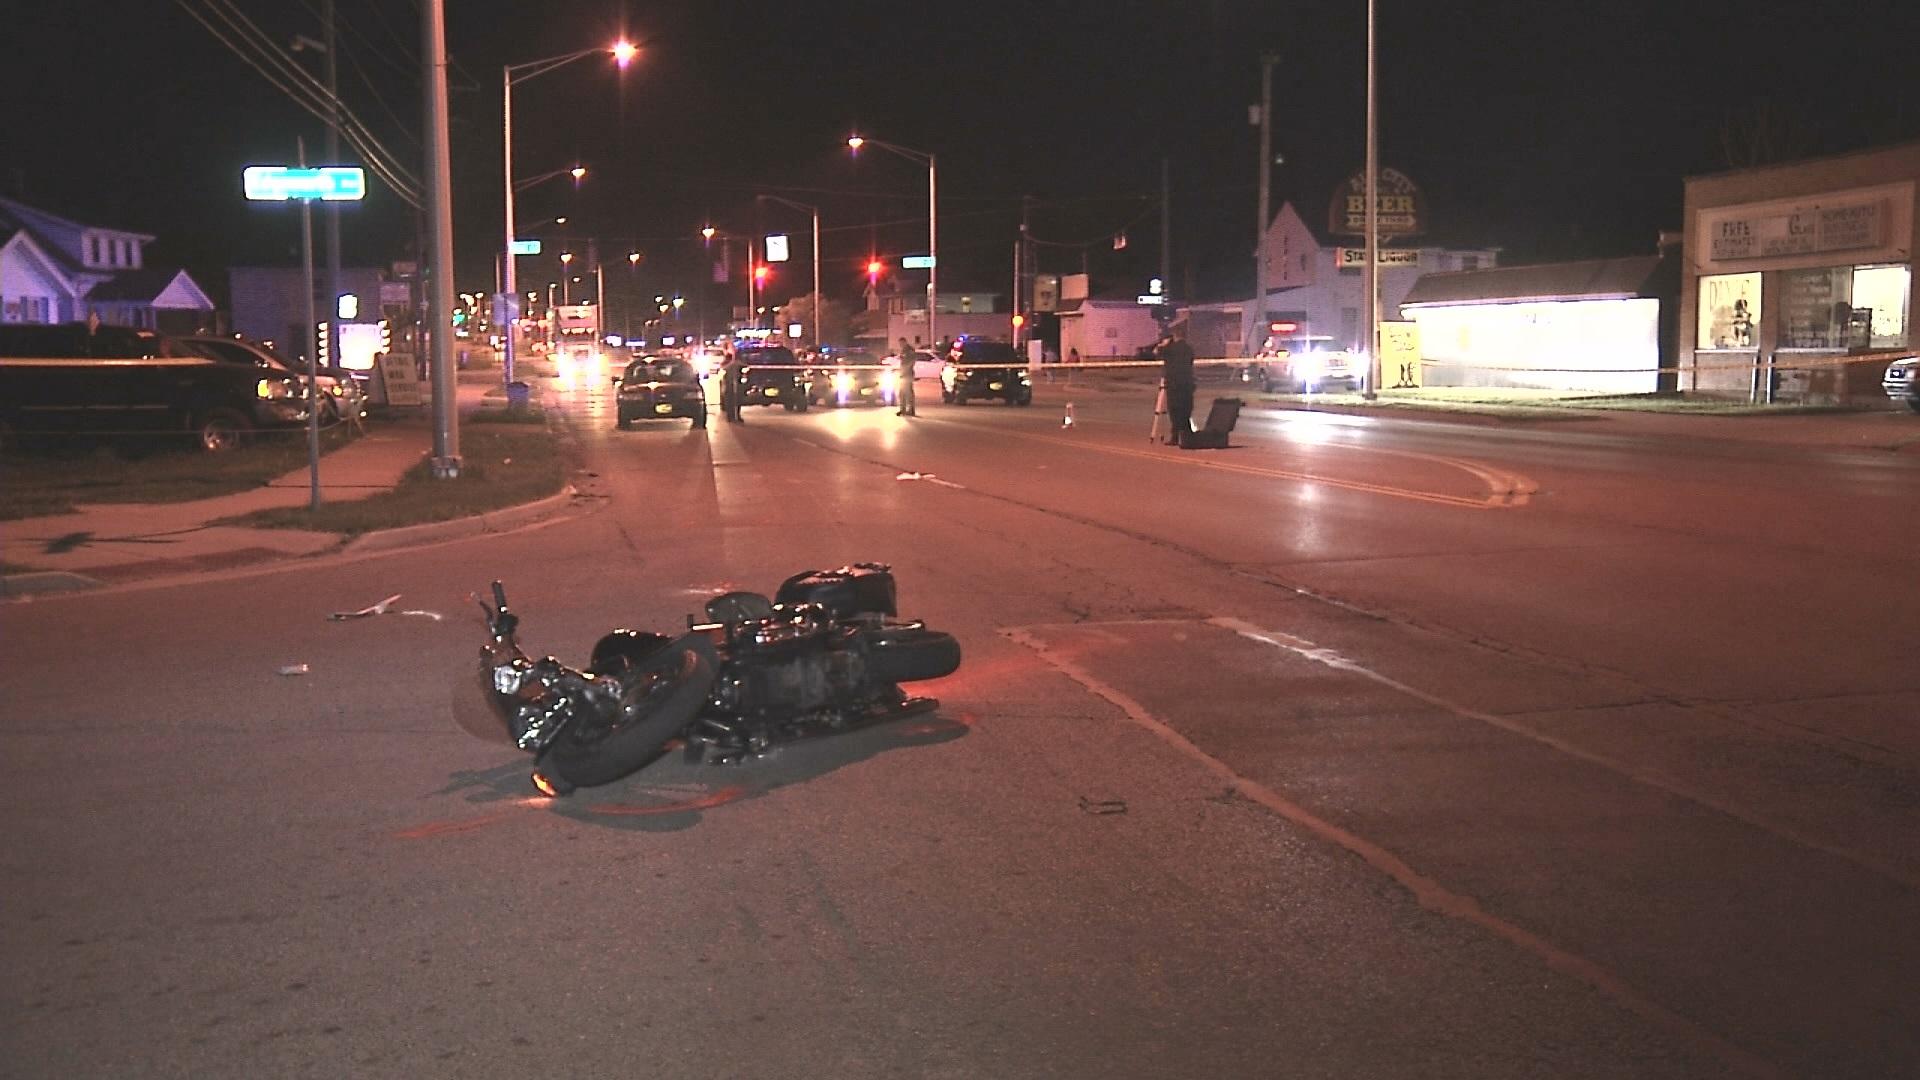 motorcycle_crash_1525255648780.jpg